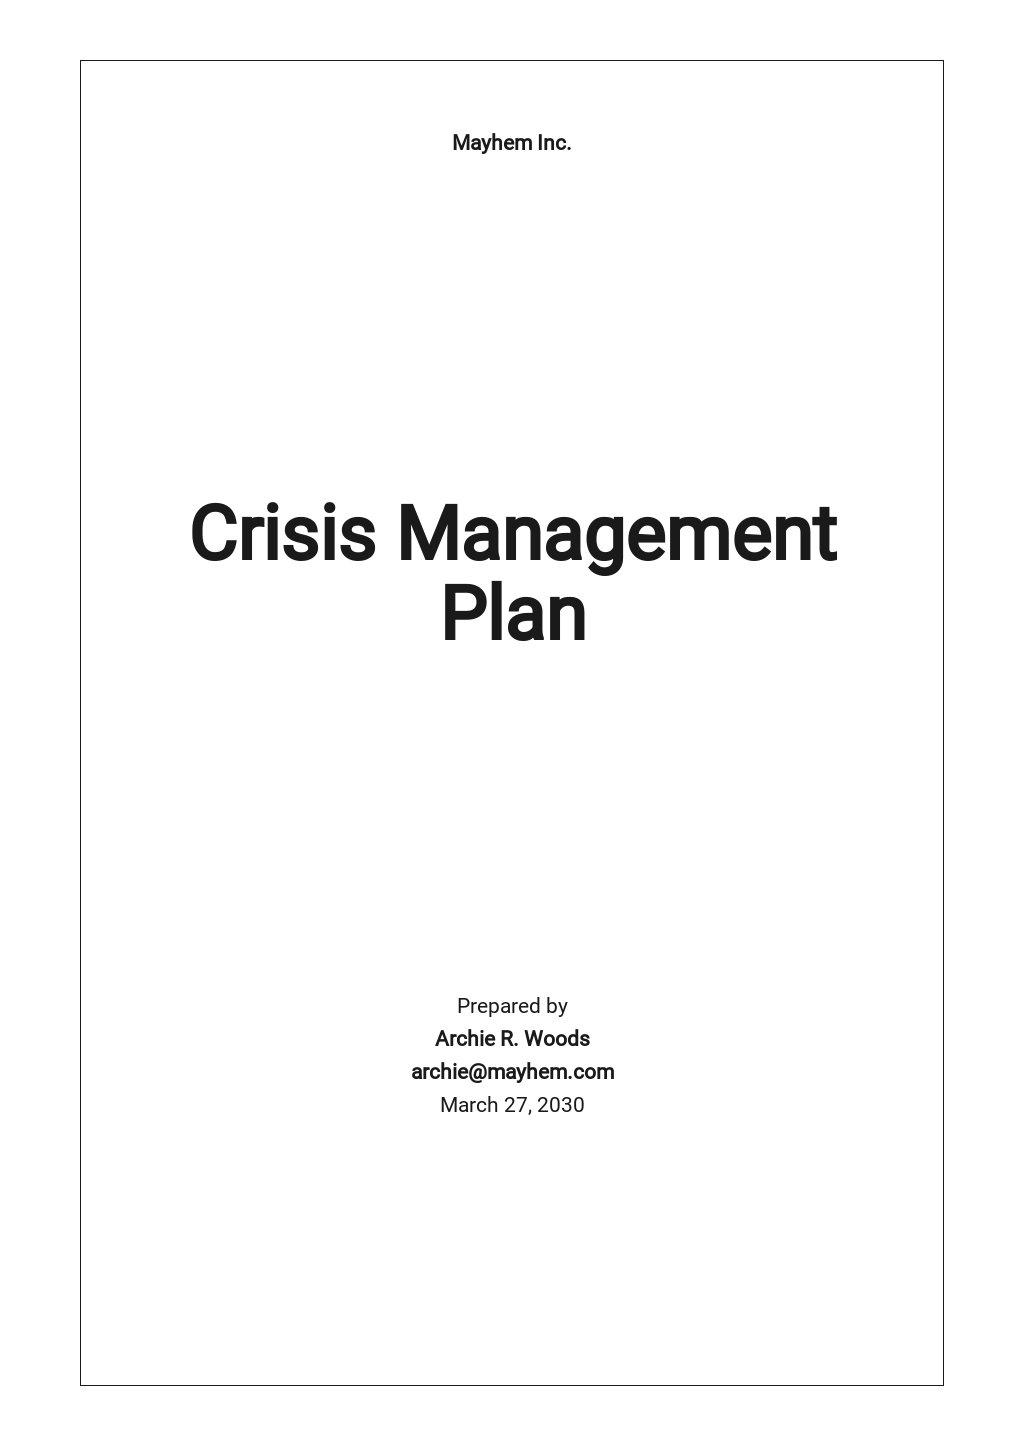 Crisis Management Plan Template